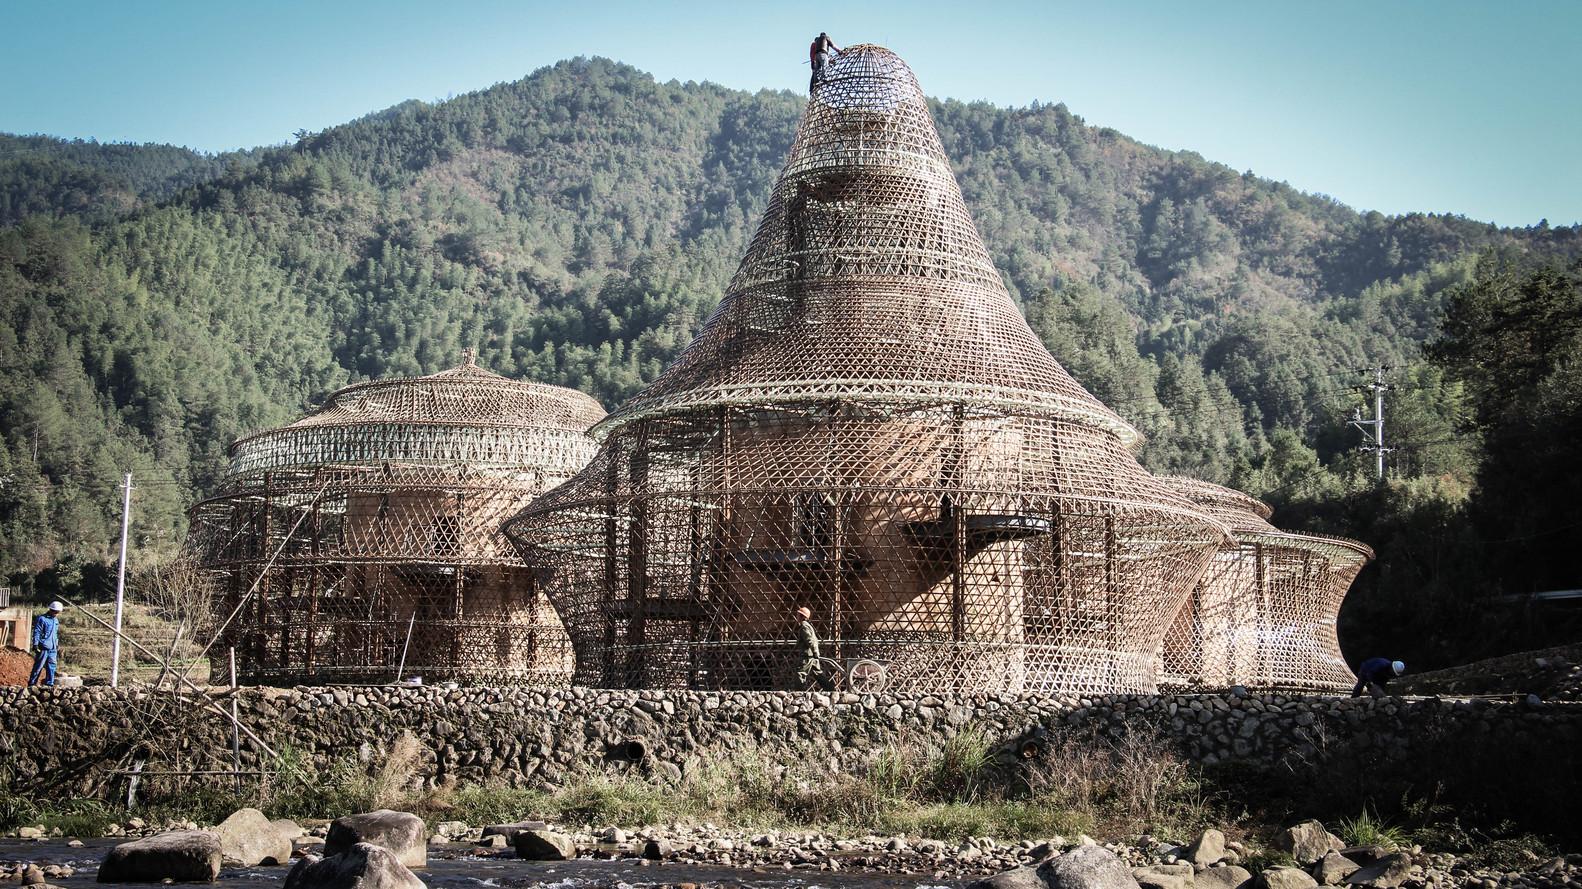 Bamboo Hostels China / Studio Anna Heringer